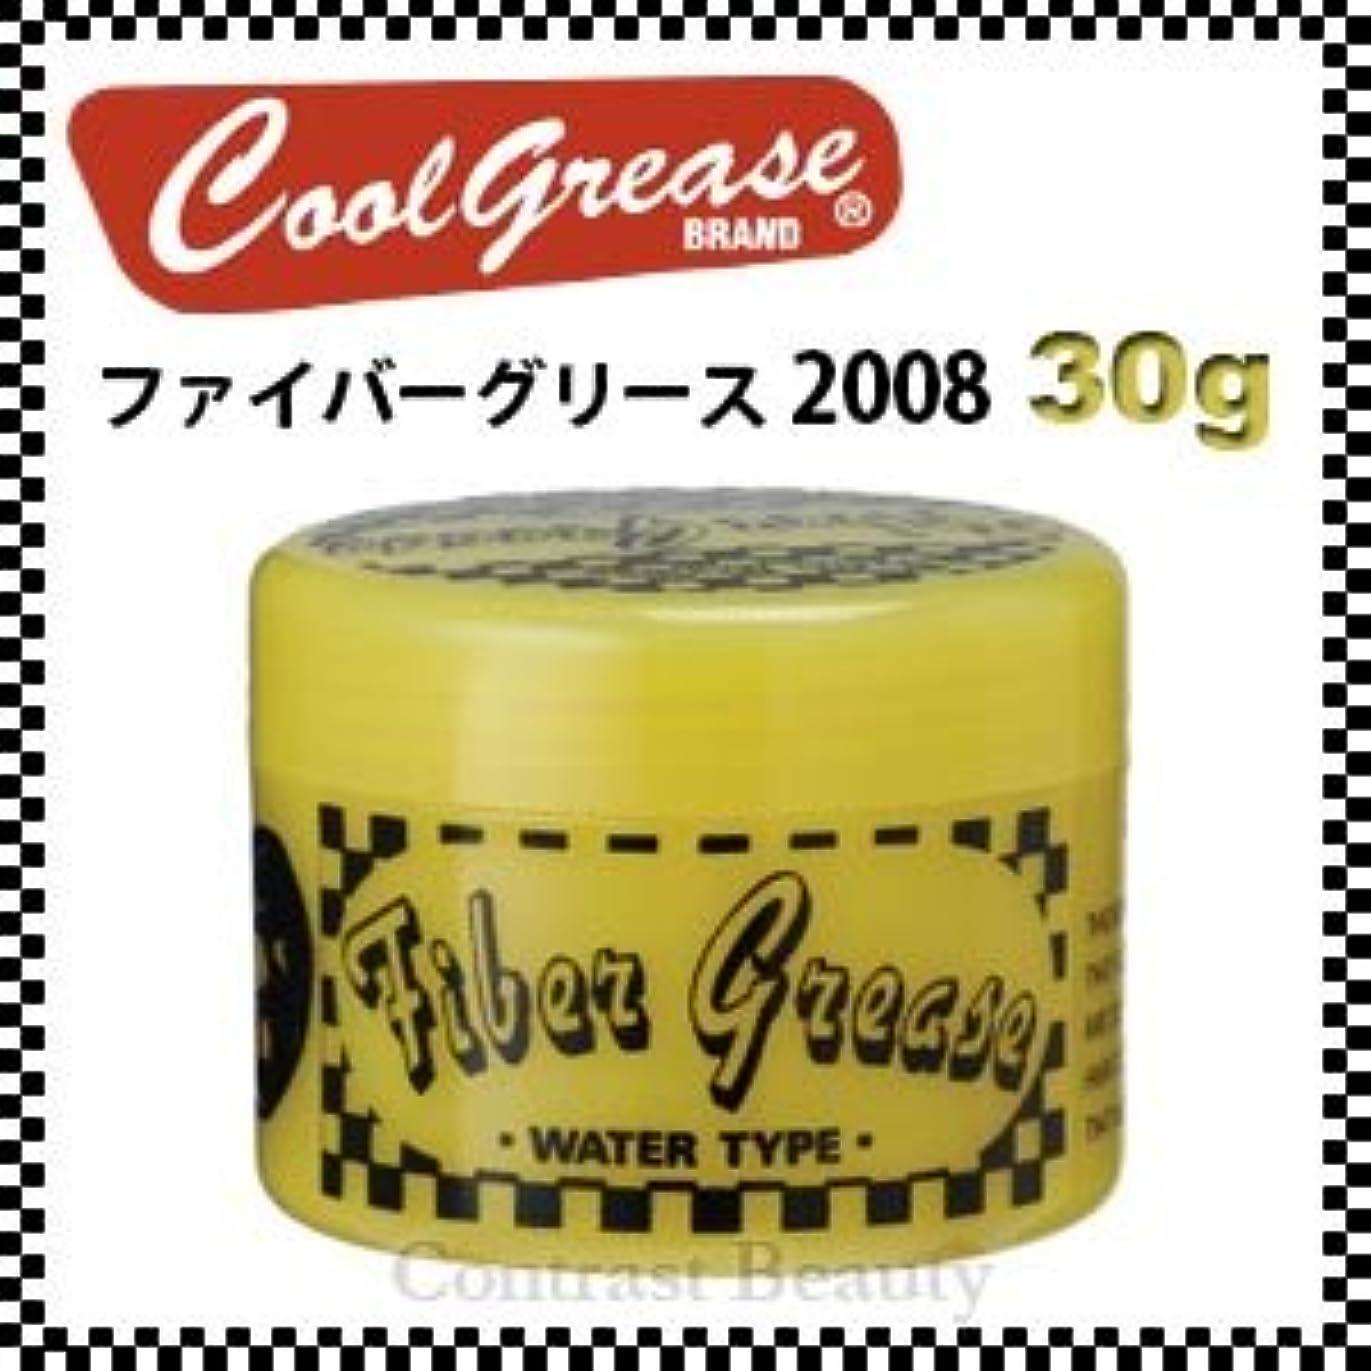 入る作者公演阪本高生堂 ファイバーグリース 2008 30g